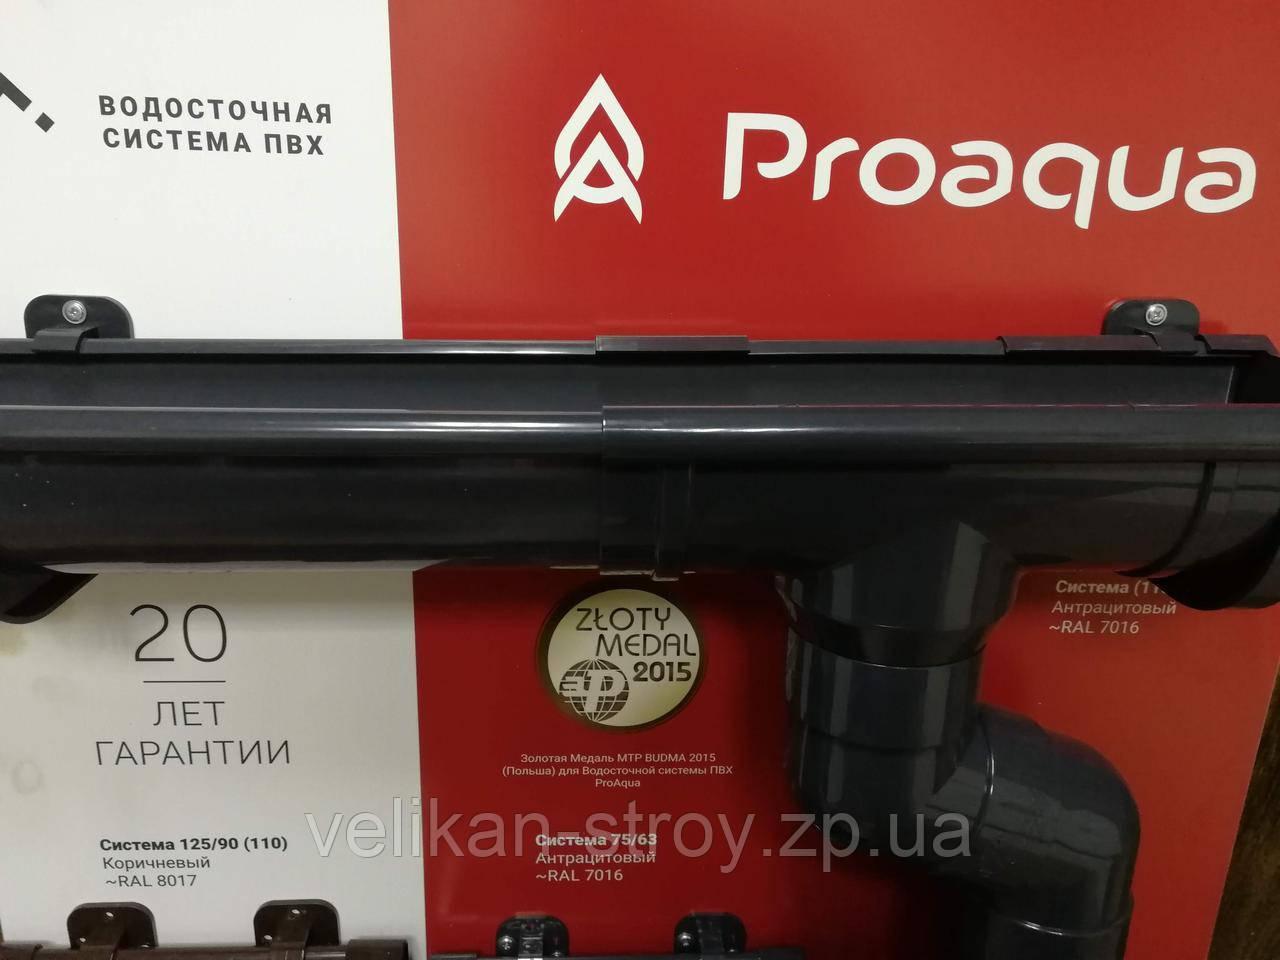 Лейка водосборная 150/110, ProAqua, фото 1